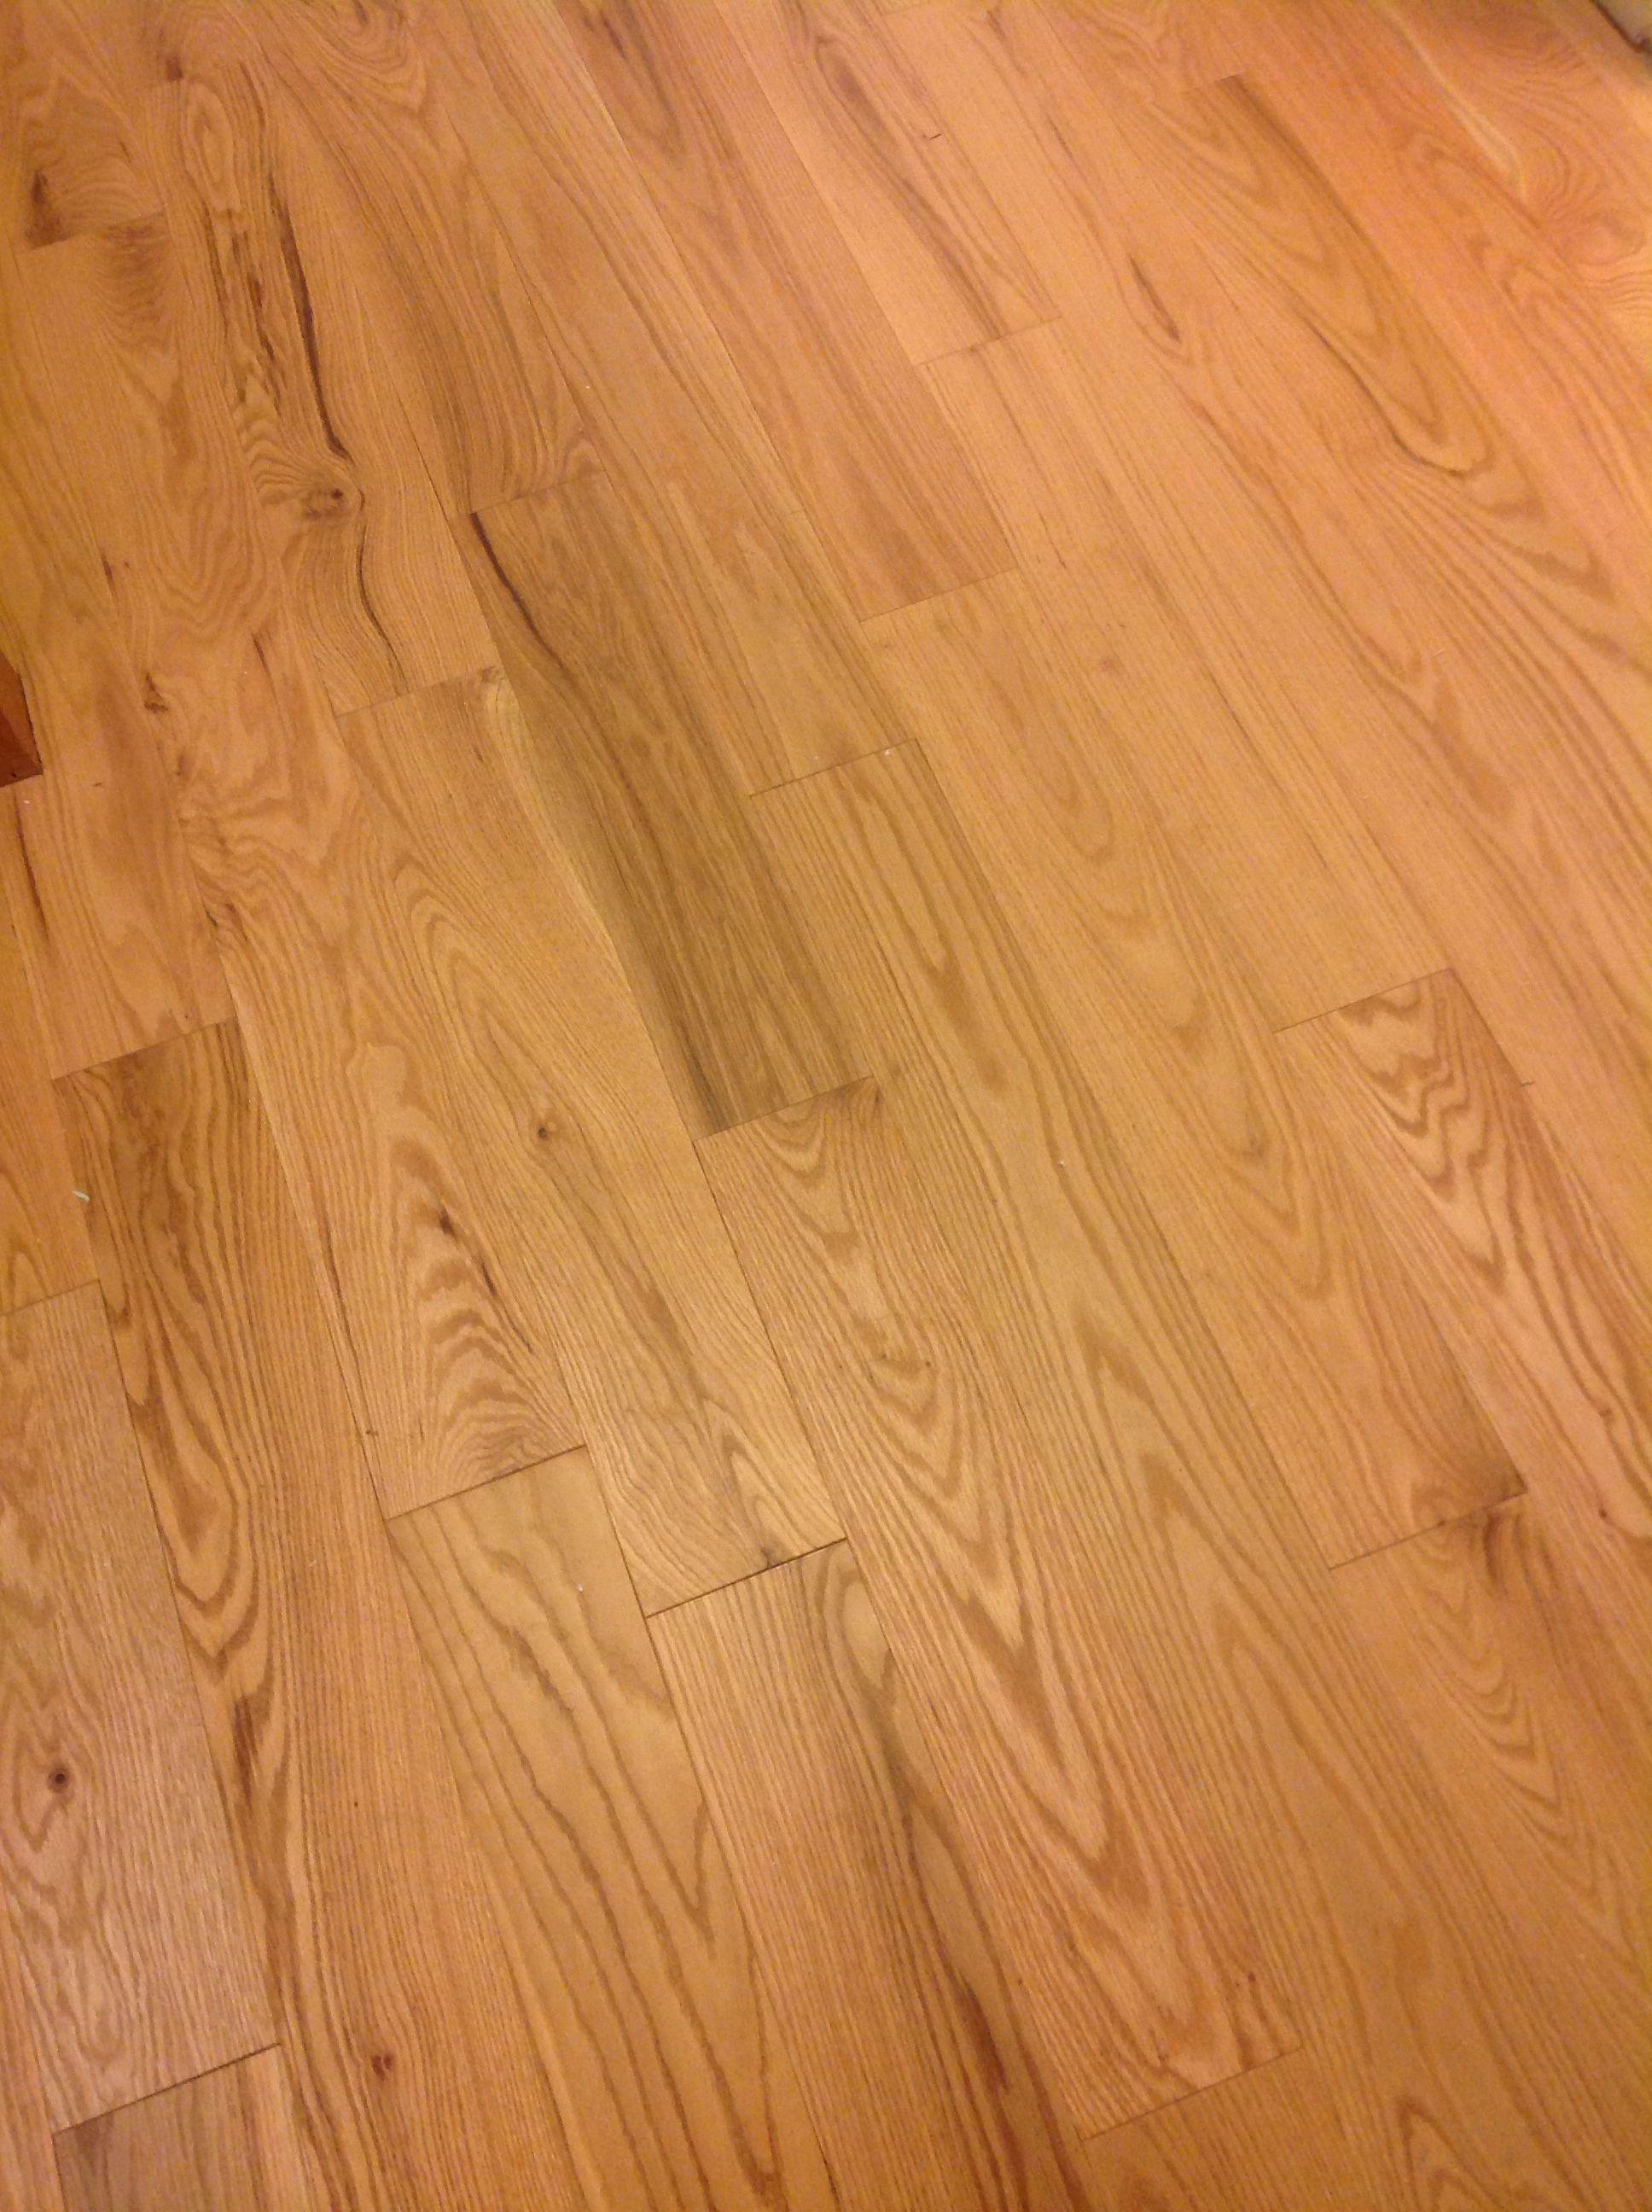 Bellawood Rustic Red Oak Matte Finish 5 Inch Hardwood Floors